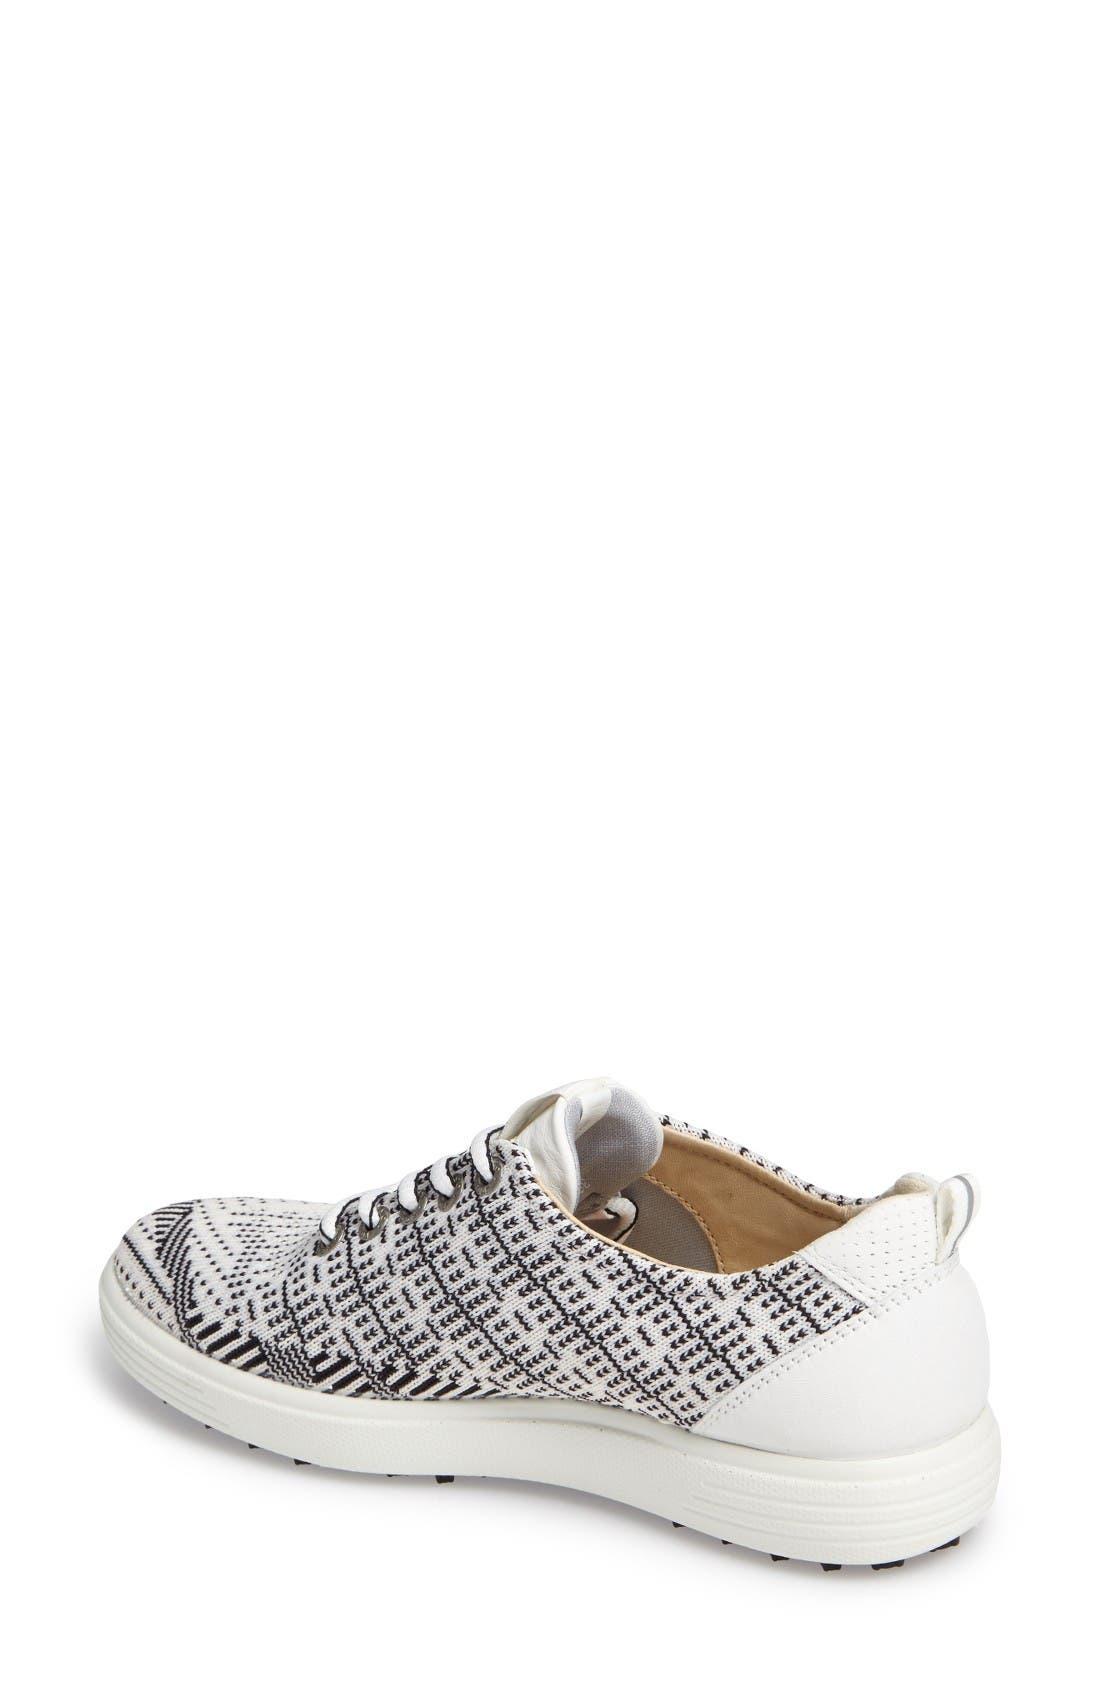 Casual Hybrid Knit Golf Sneaker,                             Alternate thumbnail 2, color,                             White/ Black/ White Leather